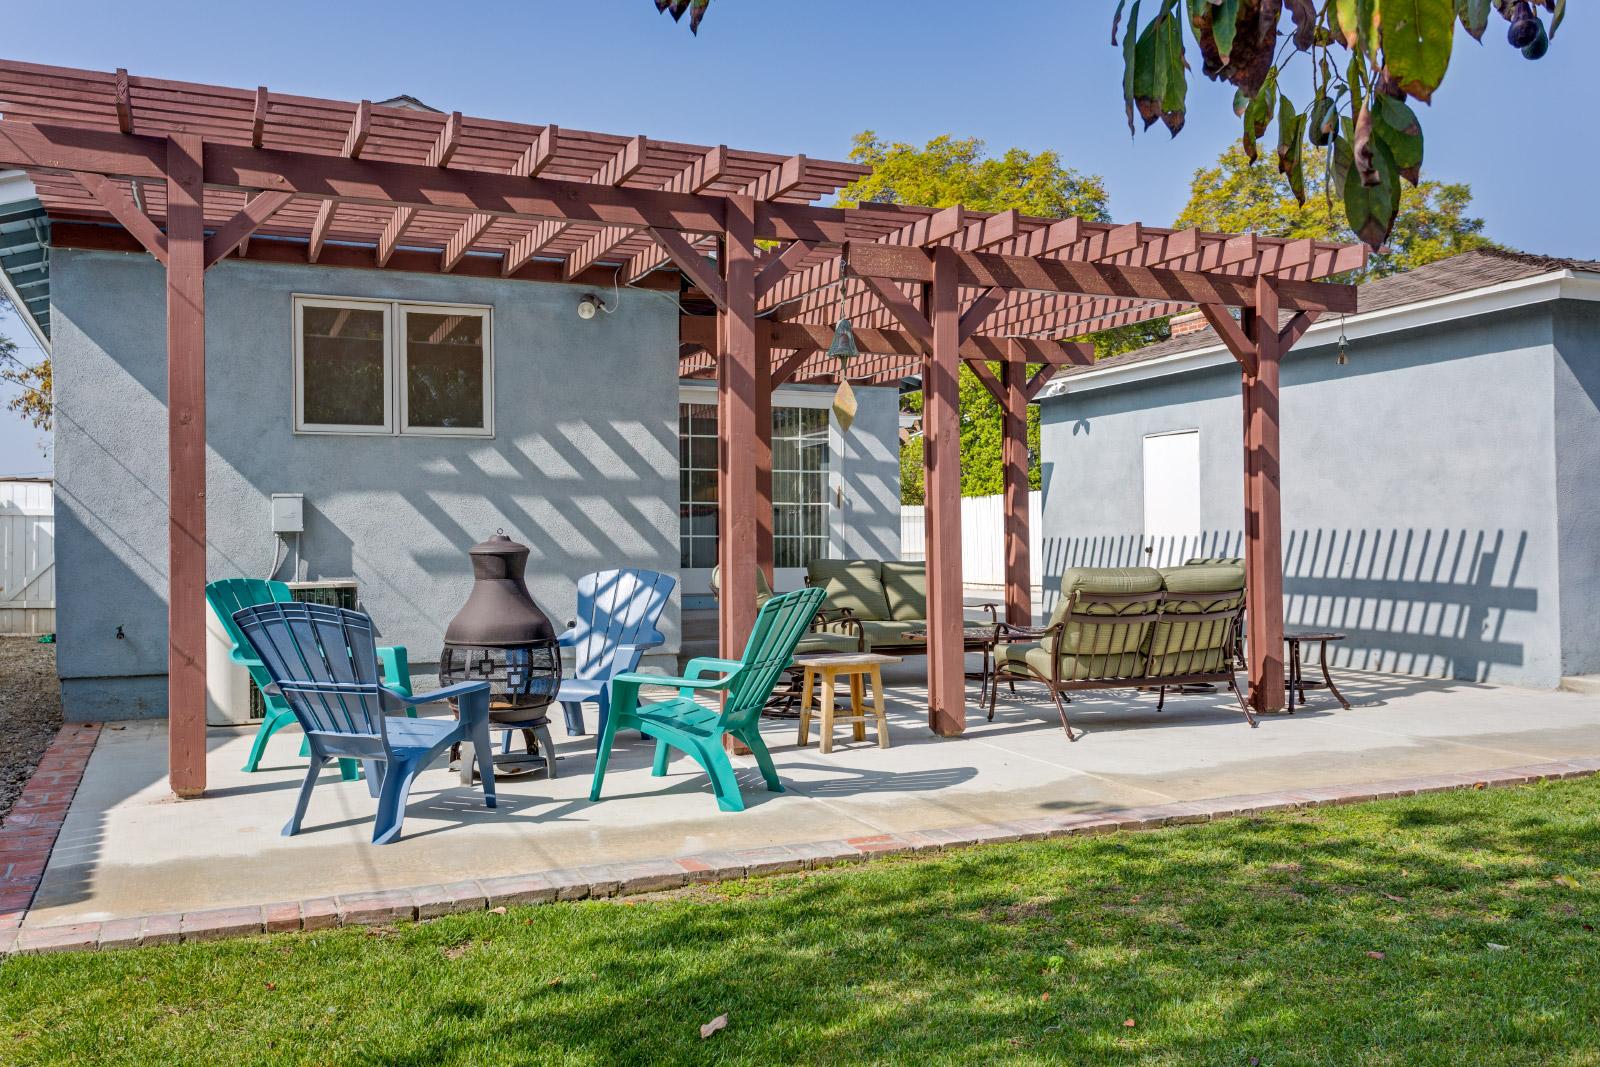 backyard-patio2_16148381503_o.jpg